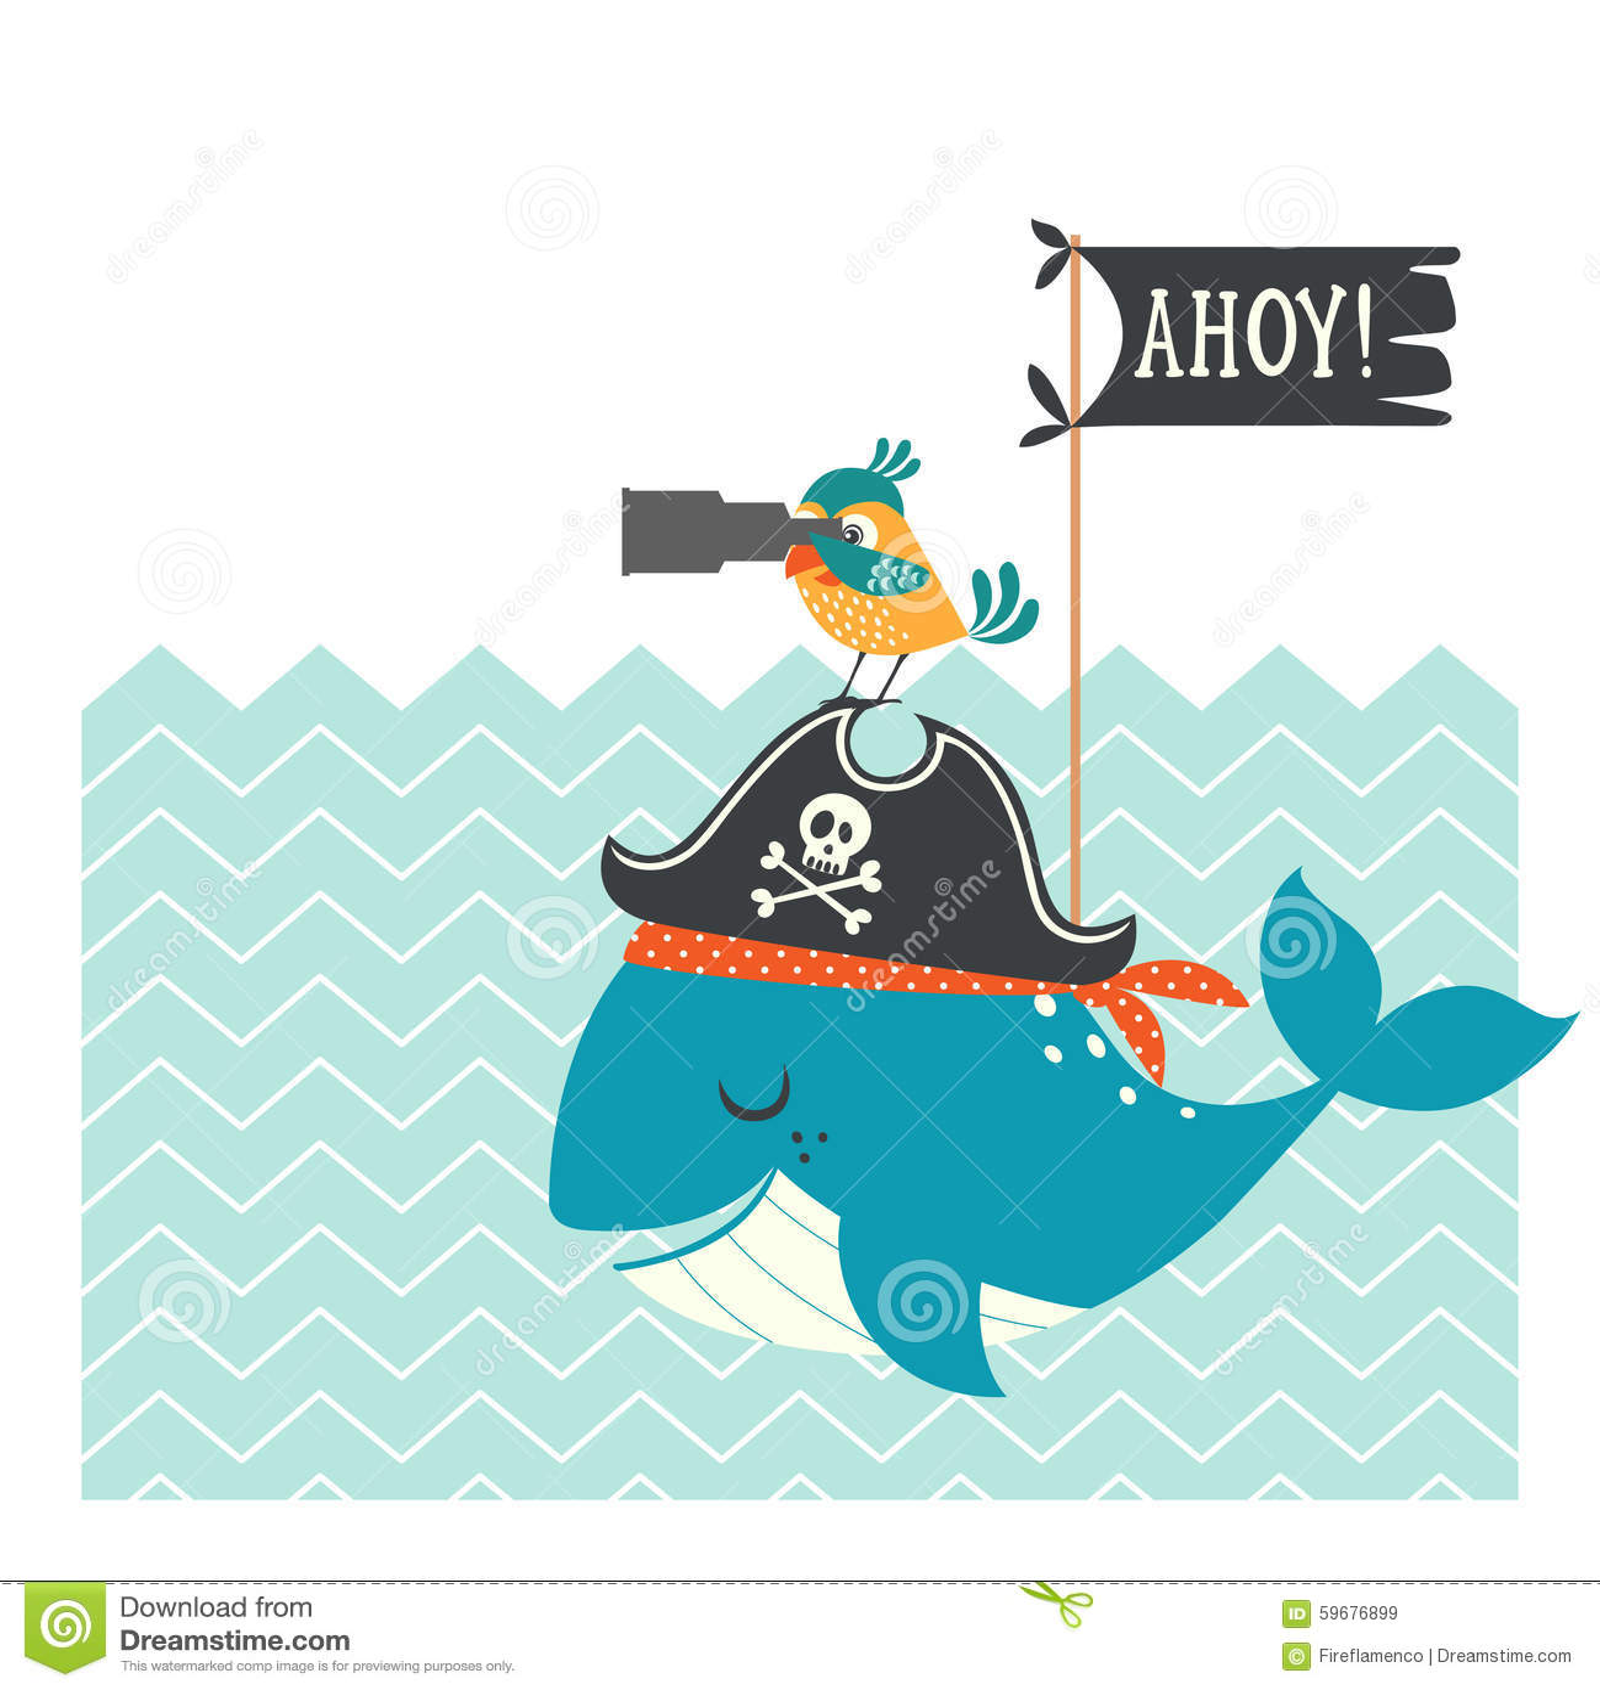 Dolphin cartoon additionally Mutiny additionally Holly Exley Watercolour moreover Dinosaur 179211 also File Shark. on funny cartoon whale